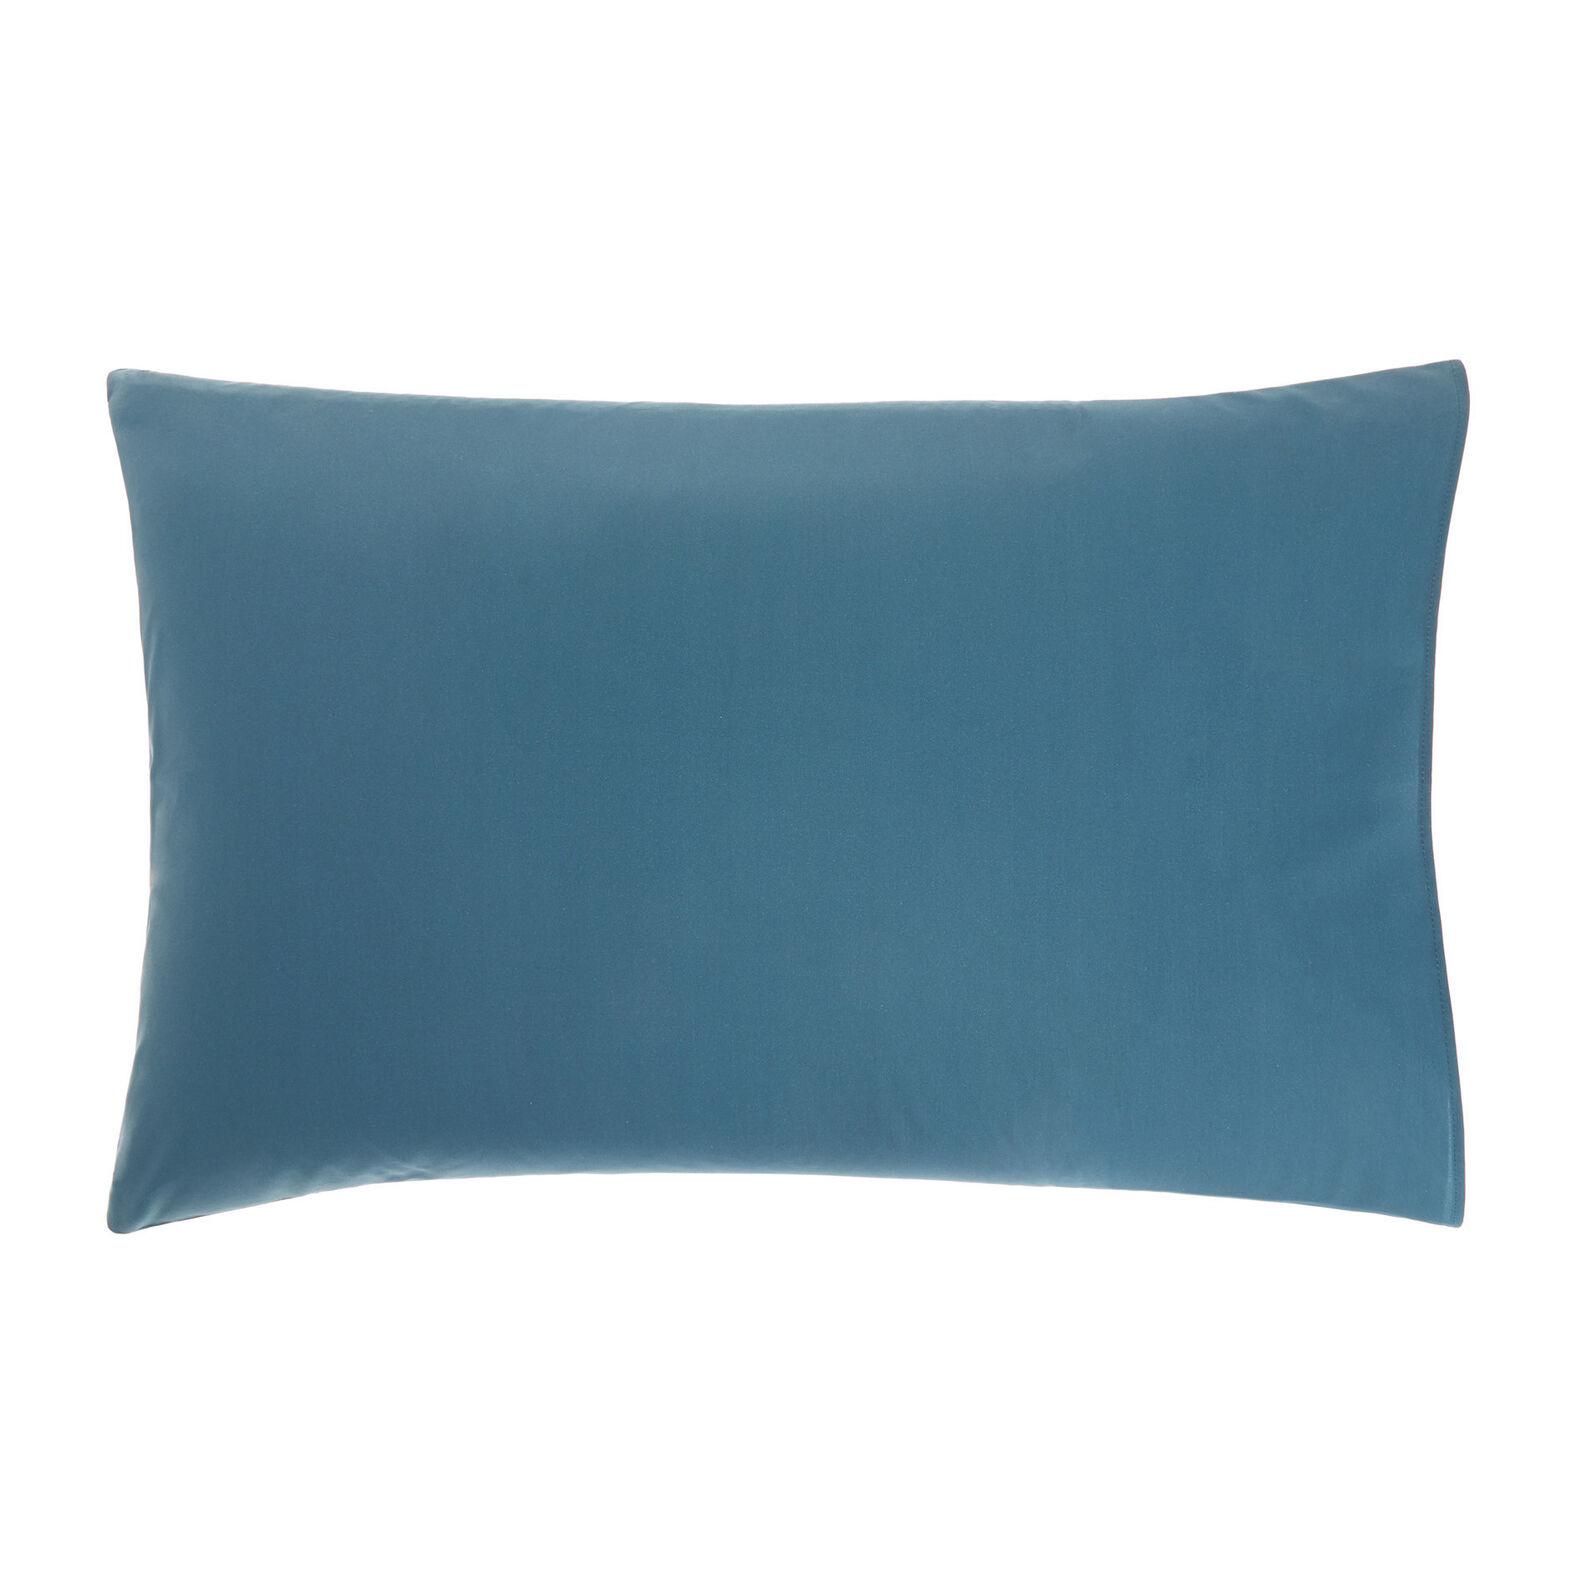 Cotton percale pillowcase with tartan pattern